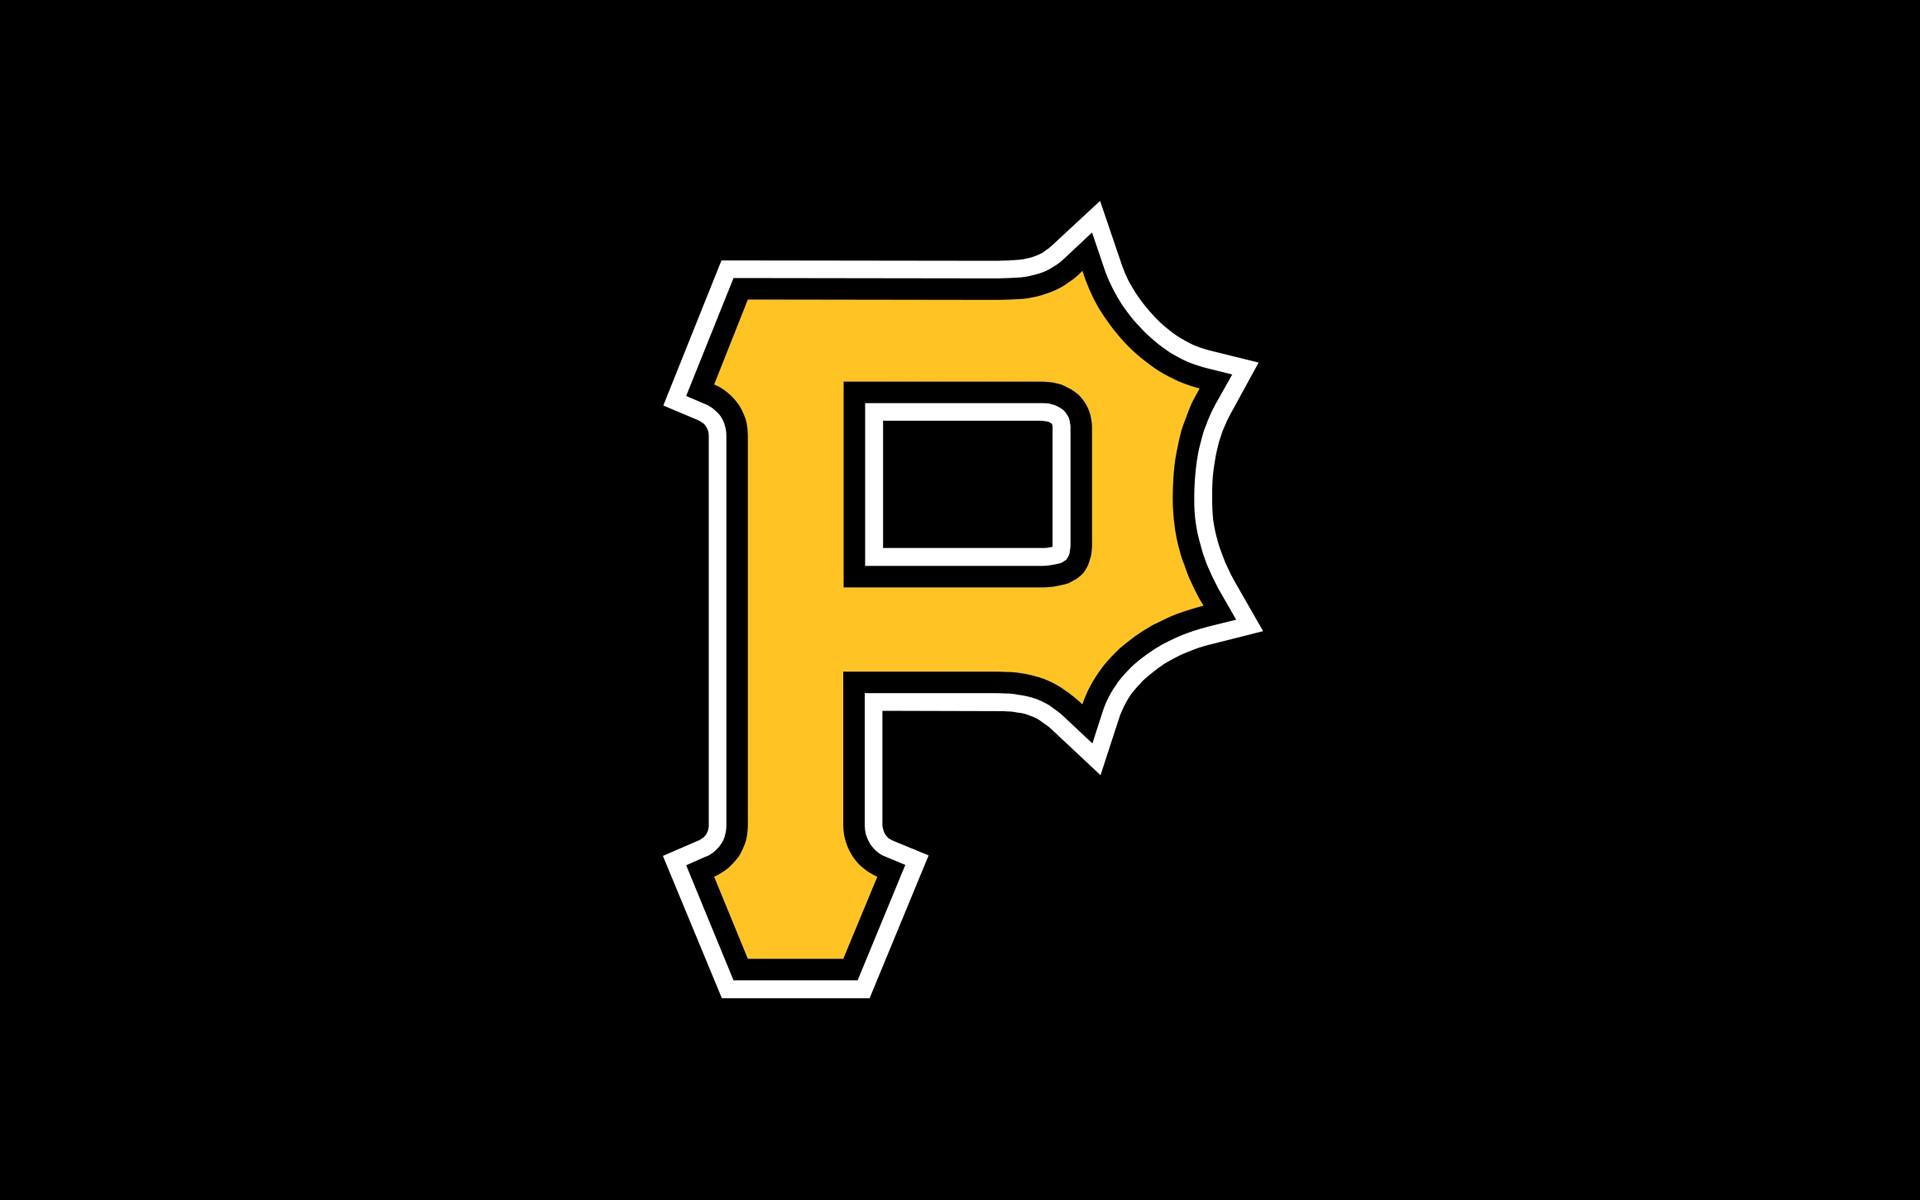 PITTSBURGH PIRATES baseball mlb d wallpaper 158325 2lKl6Dep